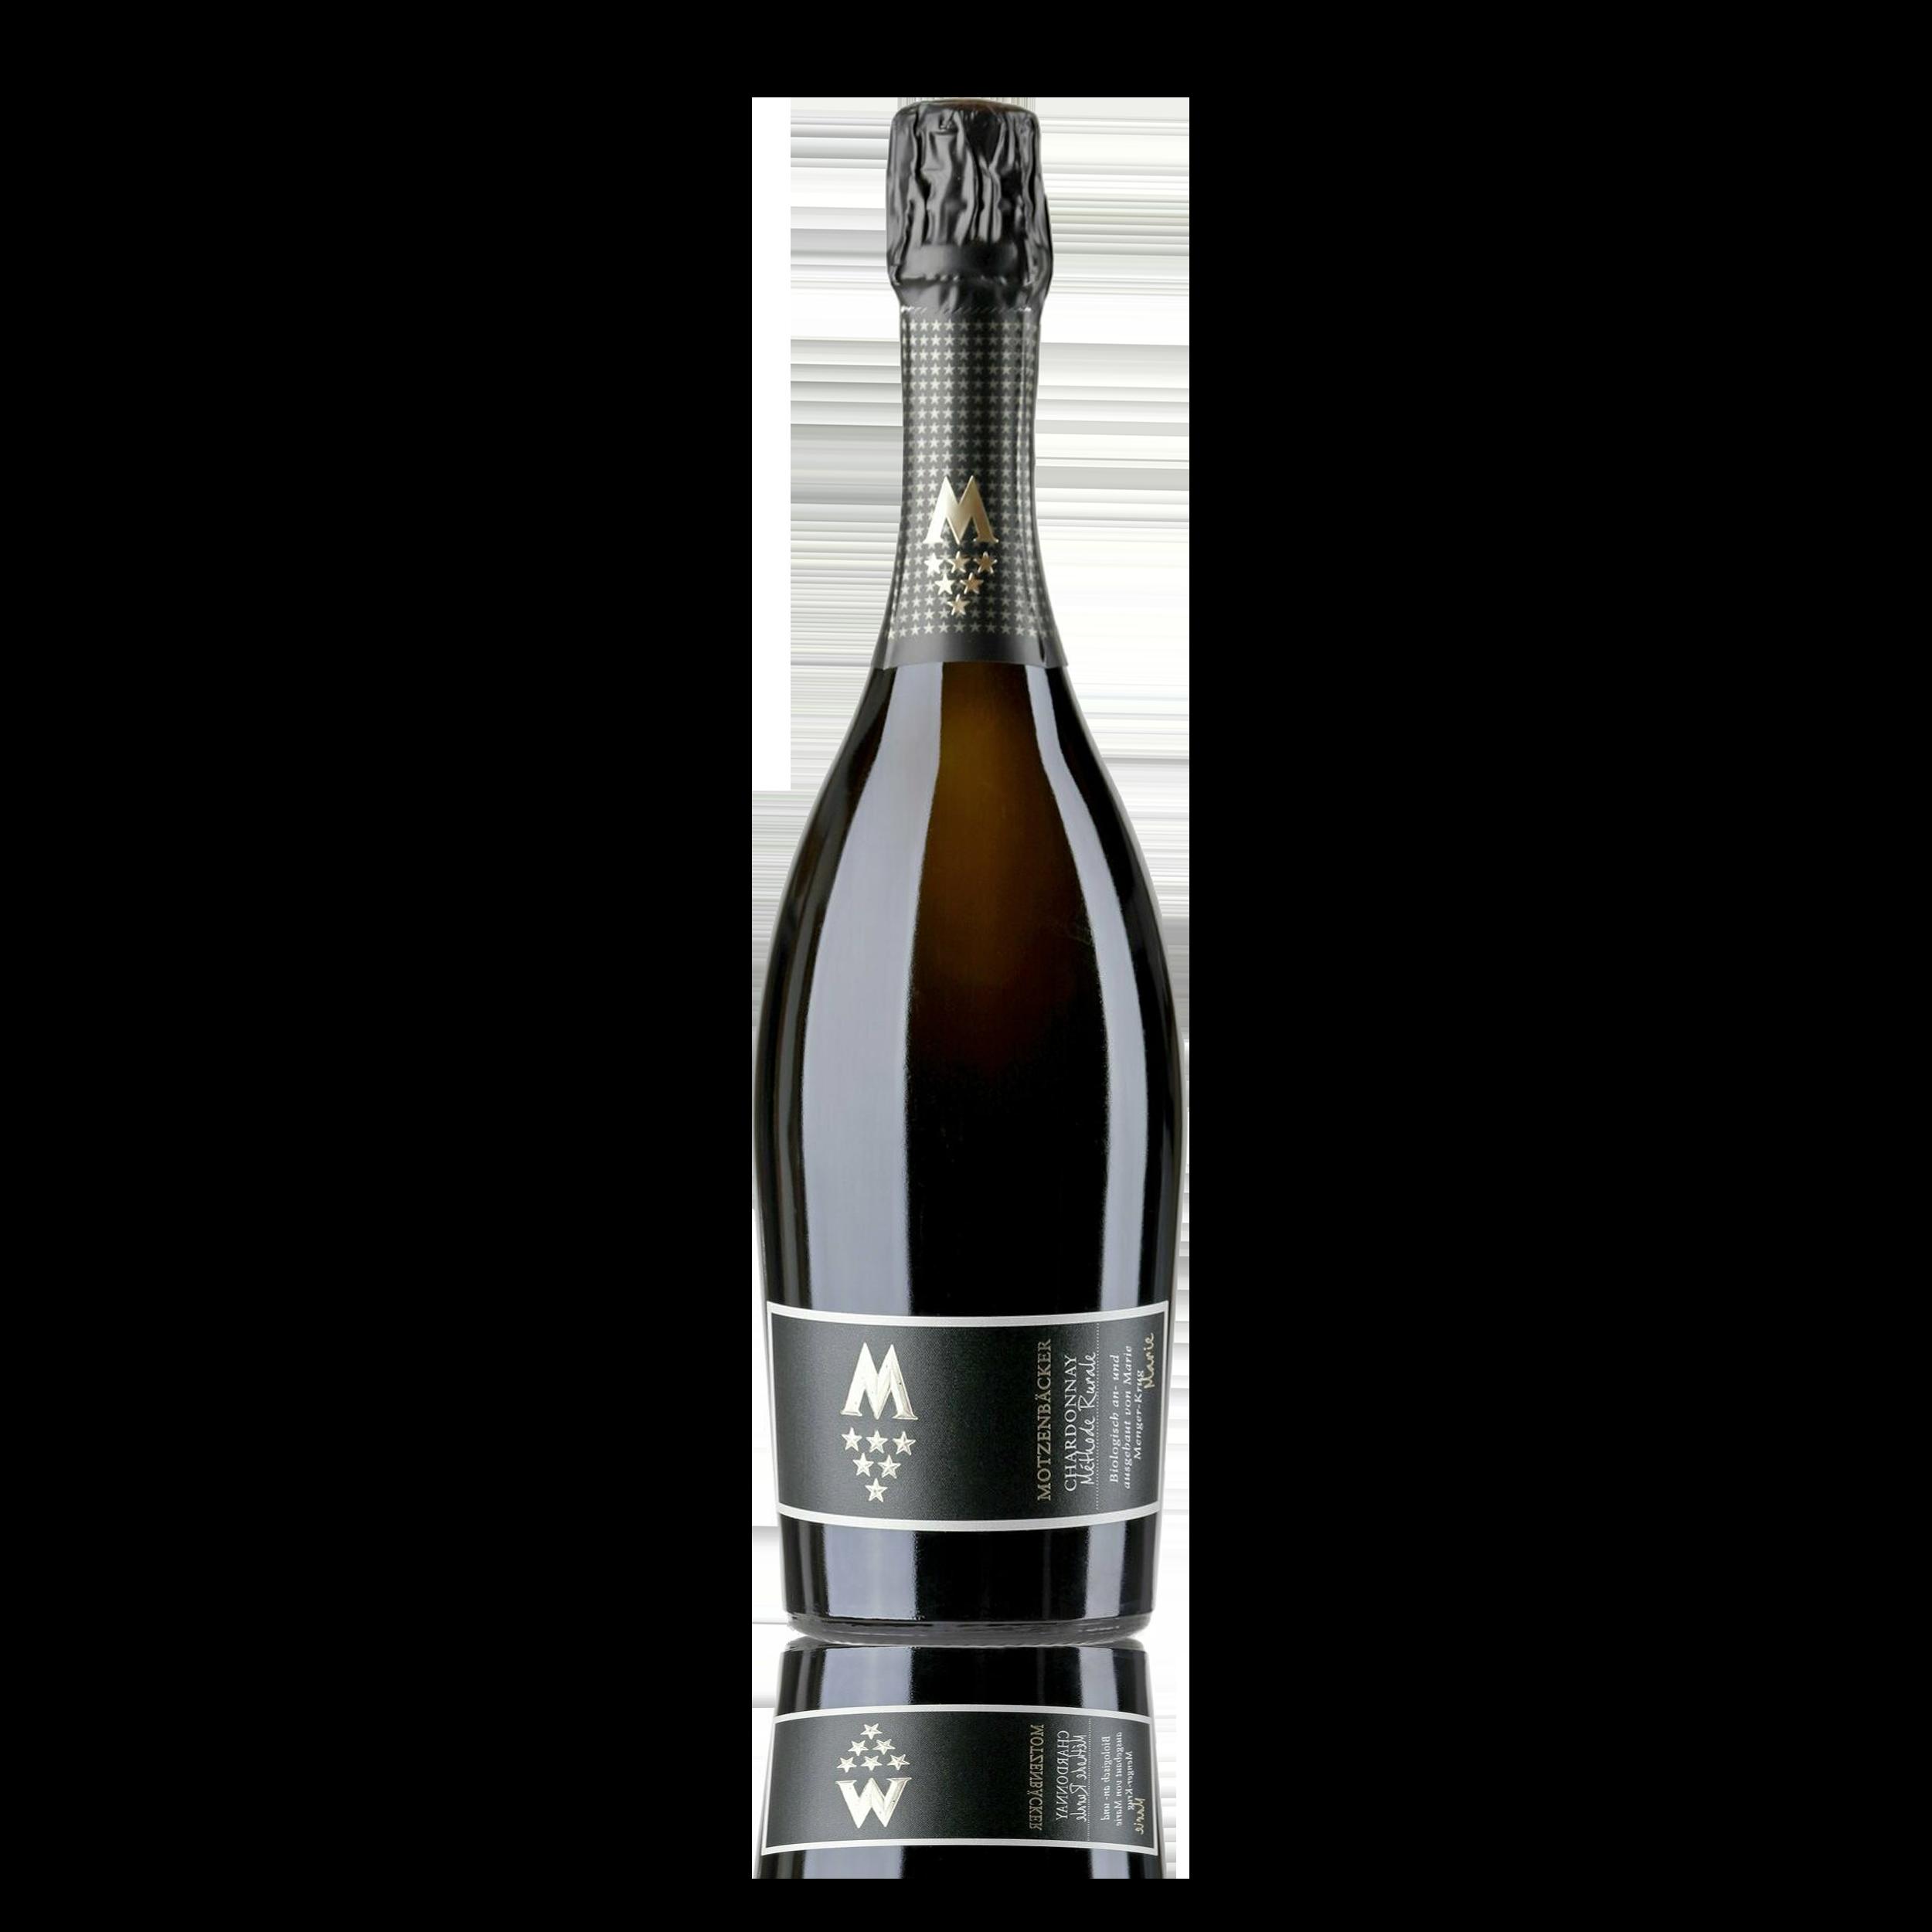 Chardonnay - Méthode Rurale 2015